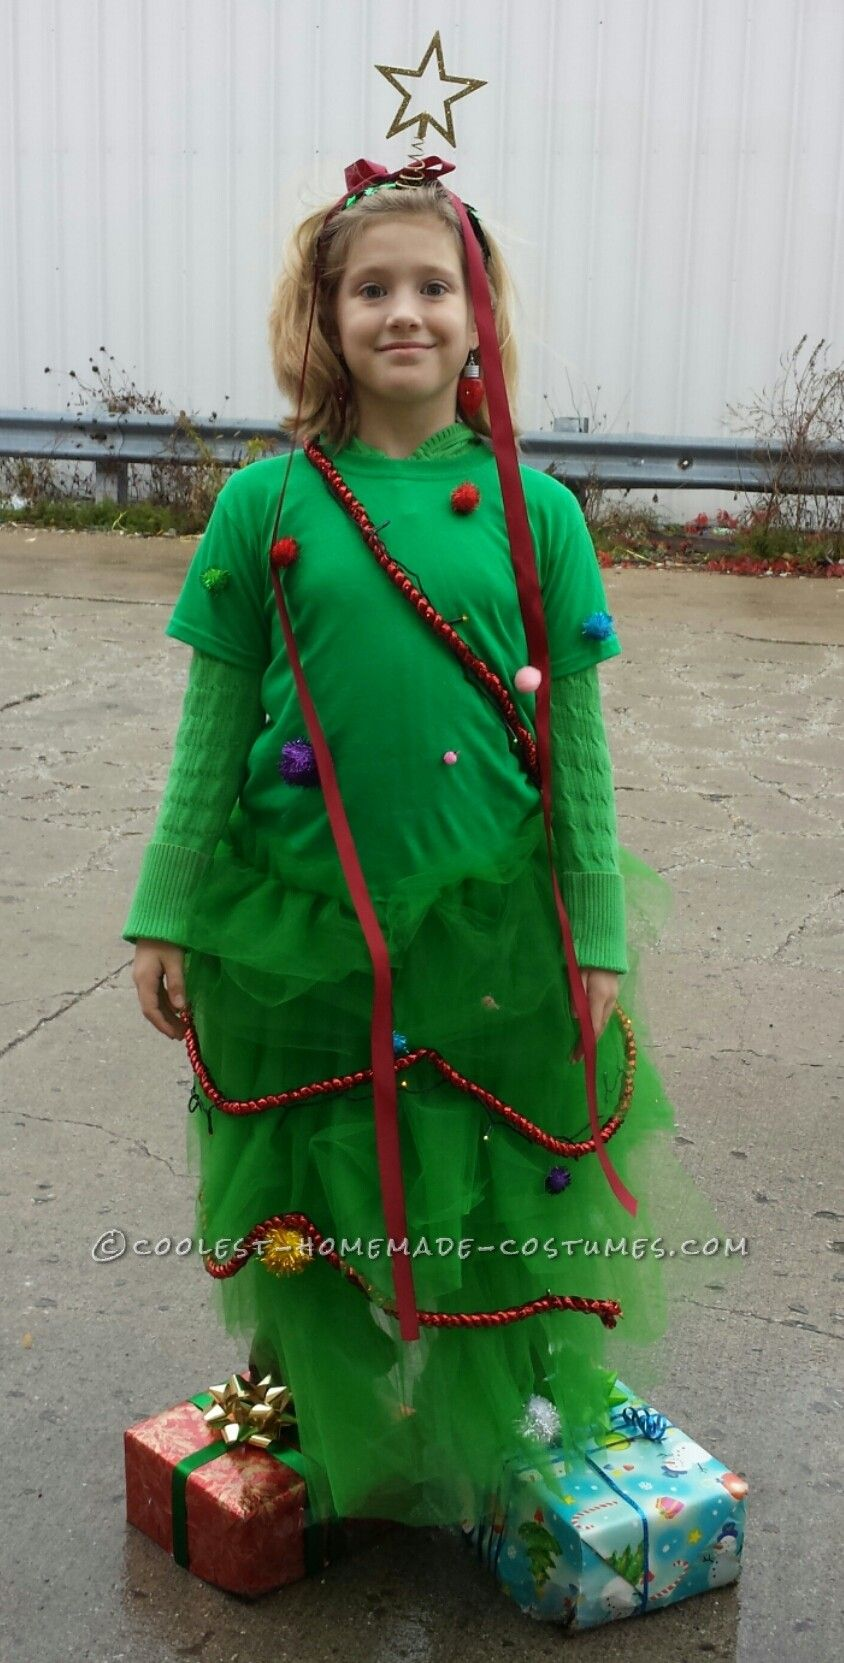 Cool Homemade Christmas Tree Halloween Costume Fall